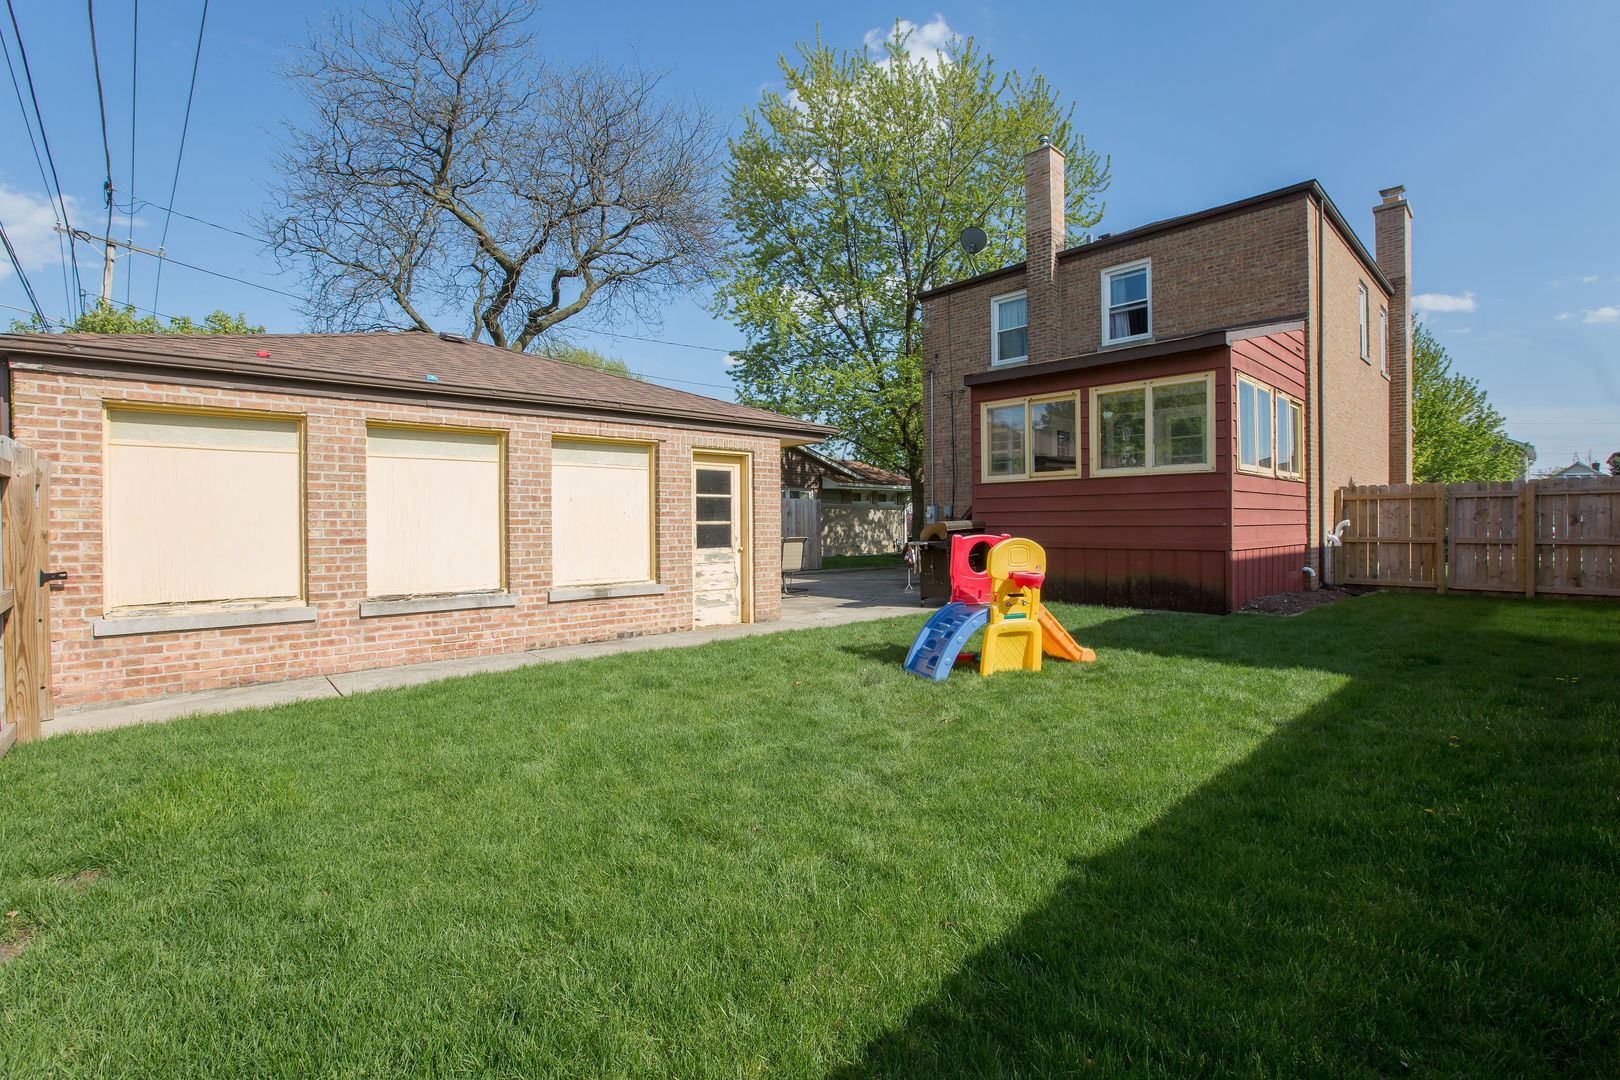 7712 West 65 th, BEDFORD PARK, Illinois, 60501